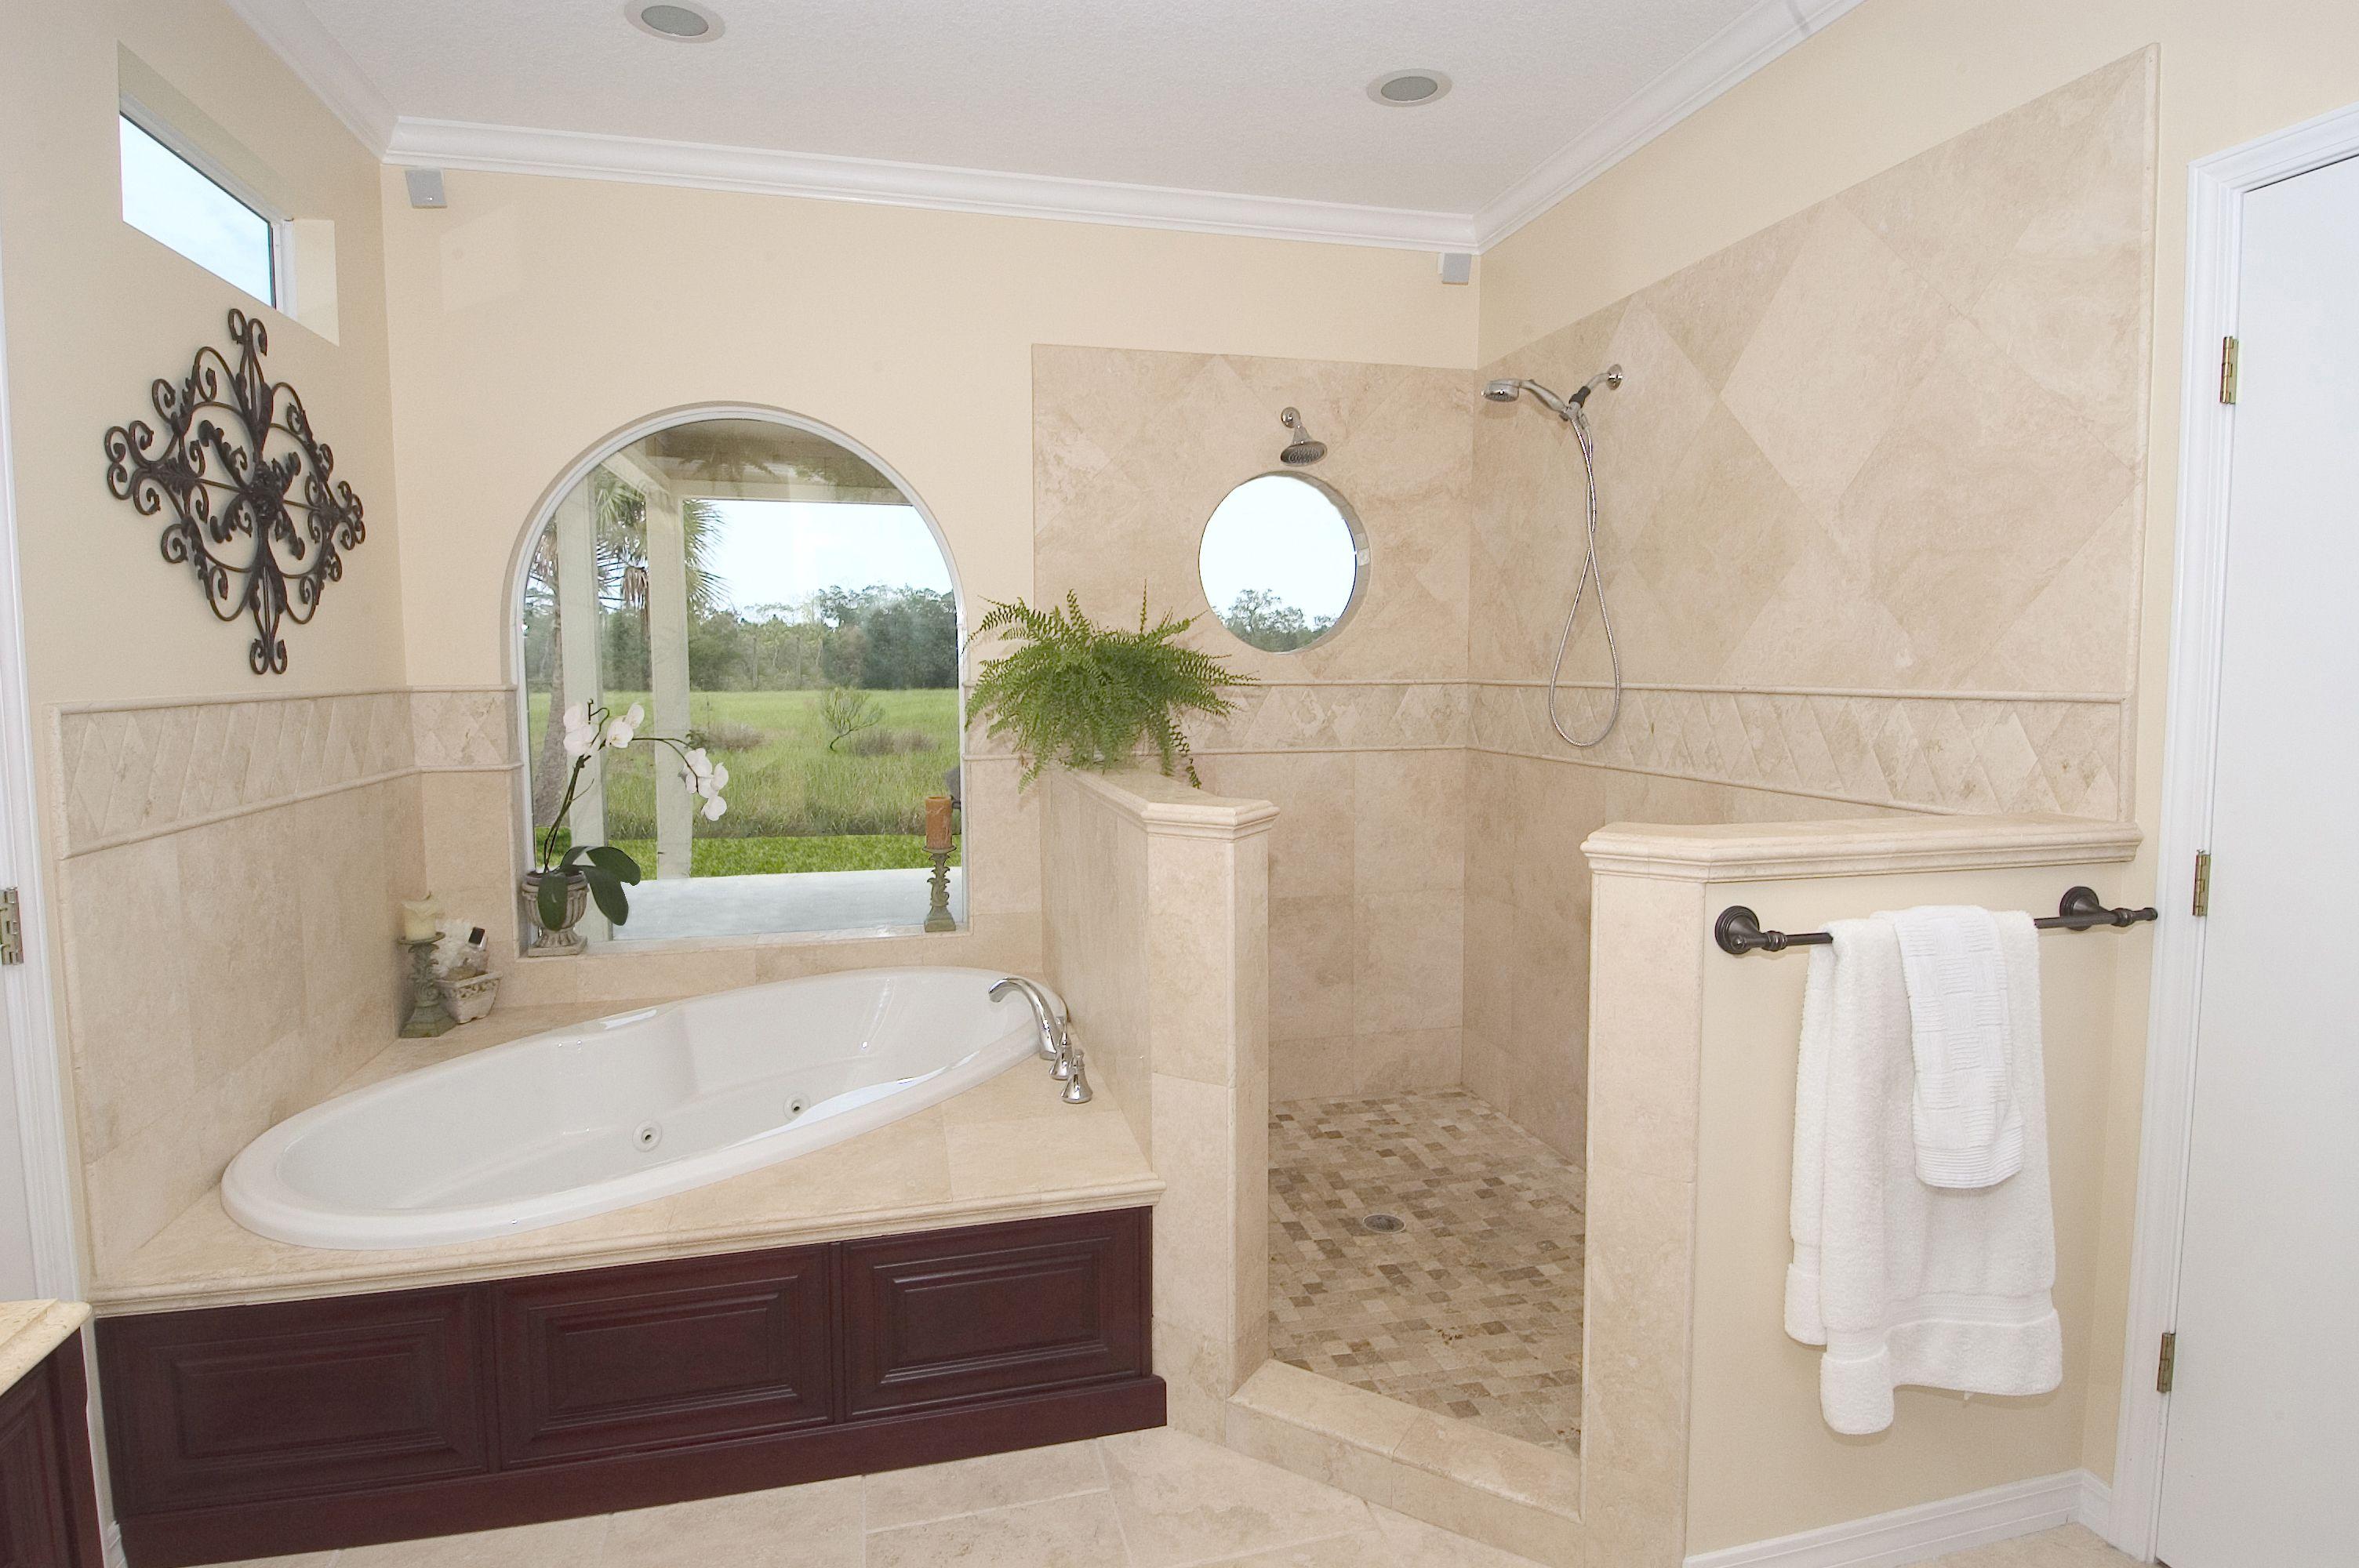 Master Bathroom Photos Gallery Bhi Construction Group Llc Bathrooms Master Bath Room A Traditional Bathroom Tile Travertine Bathroom Traditional Bathroom